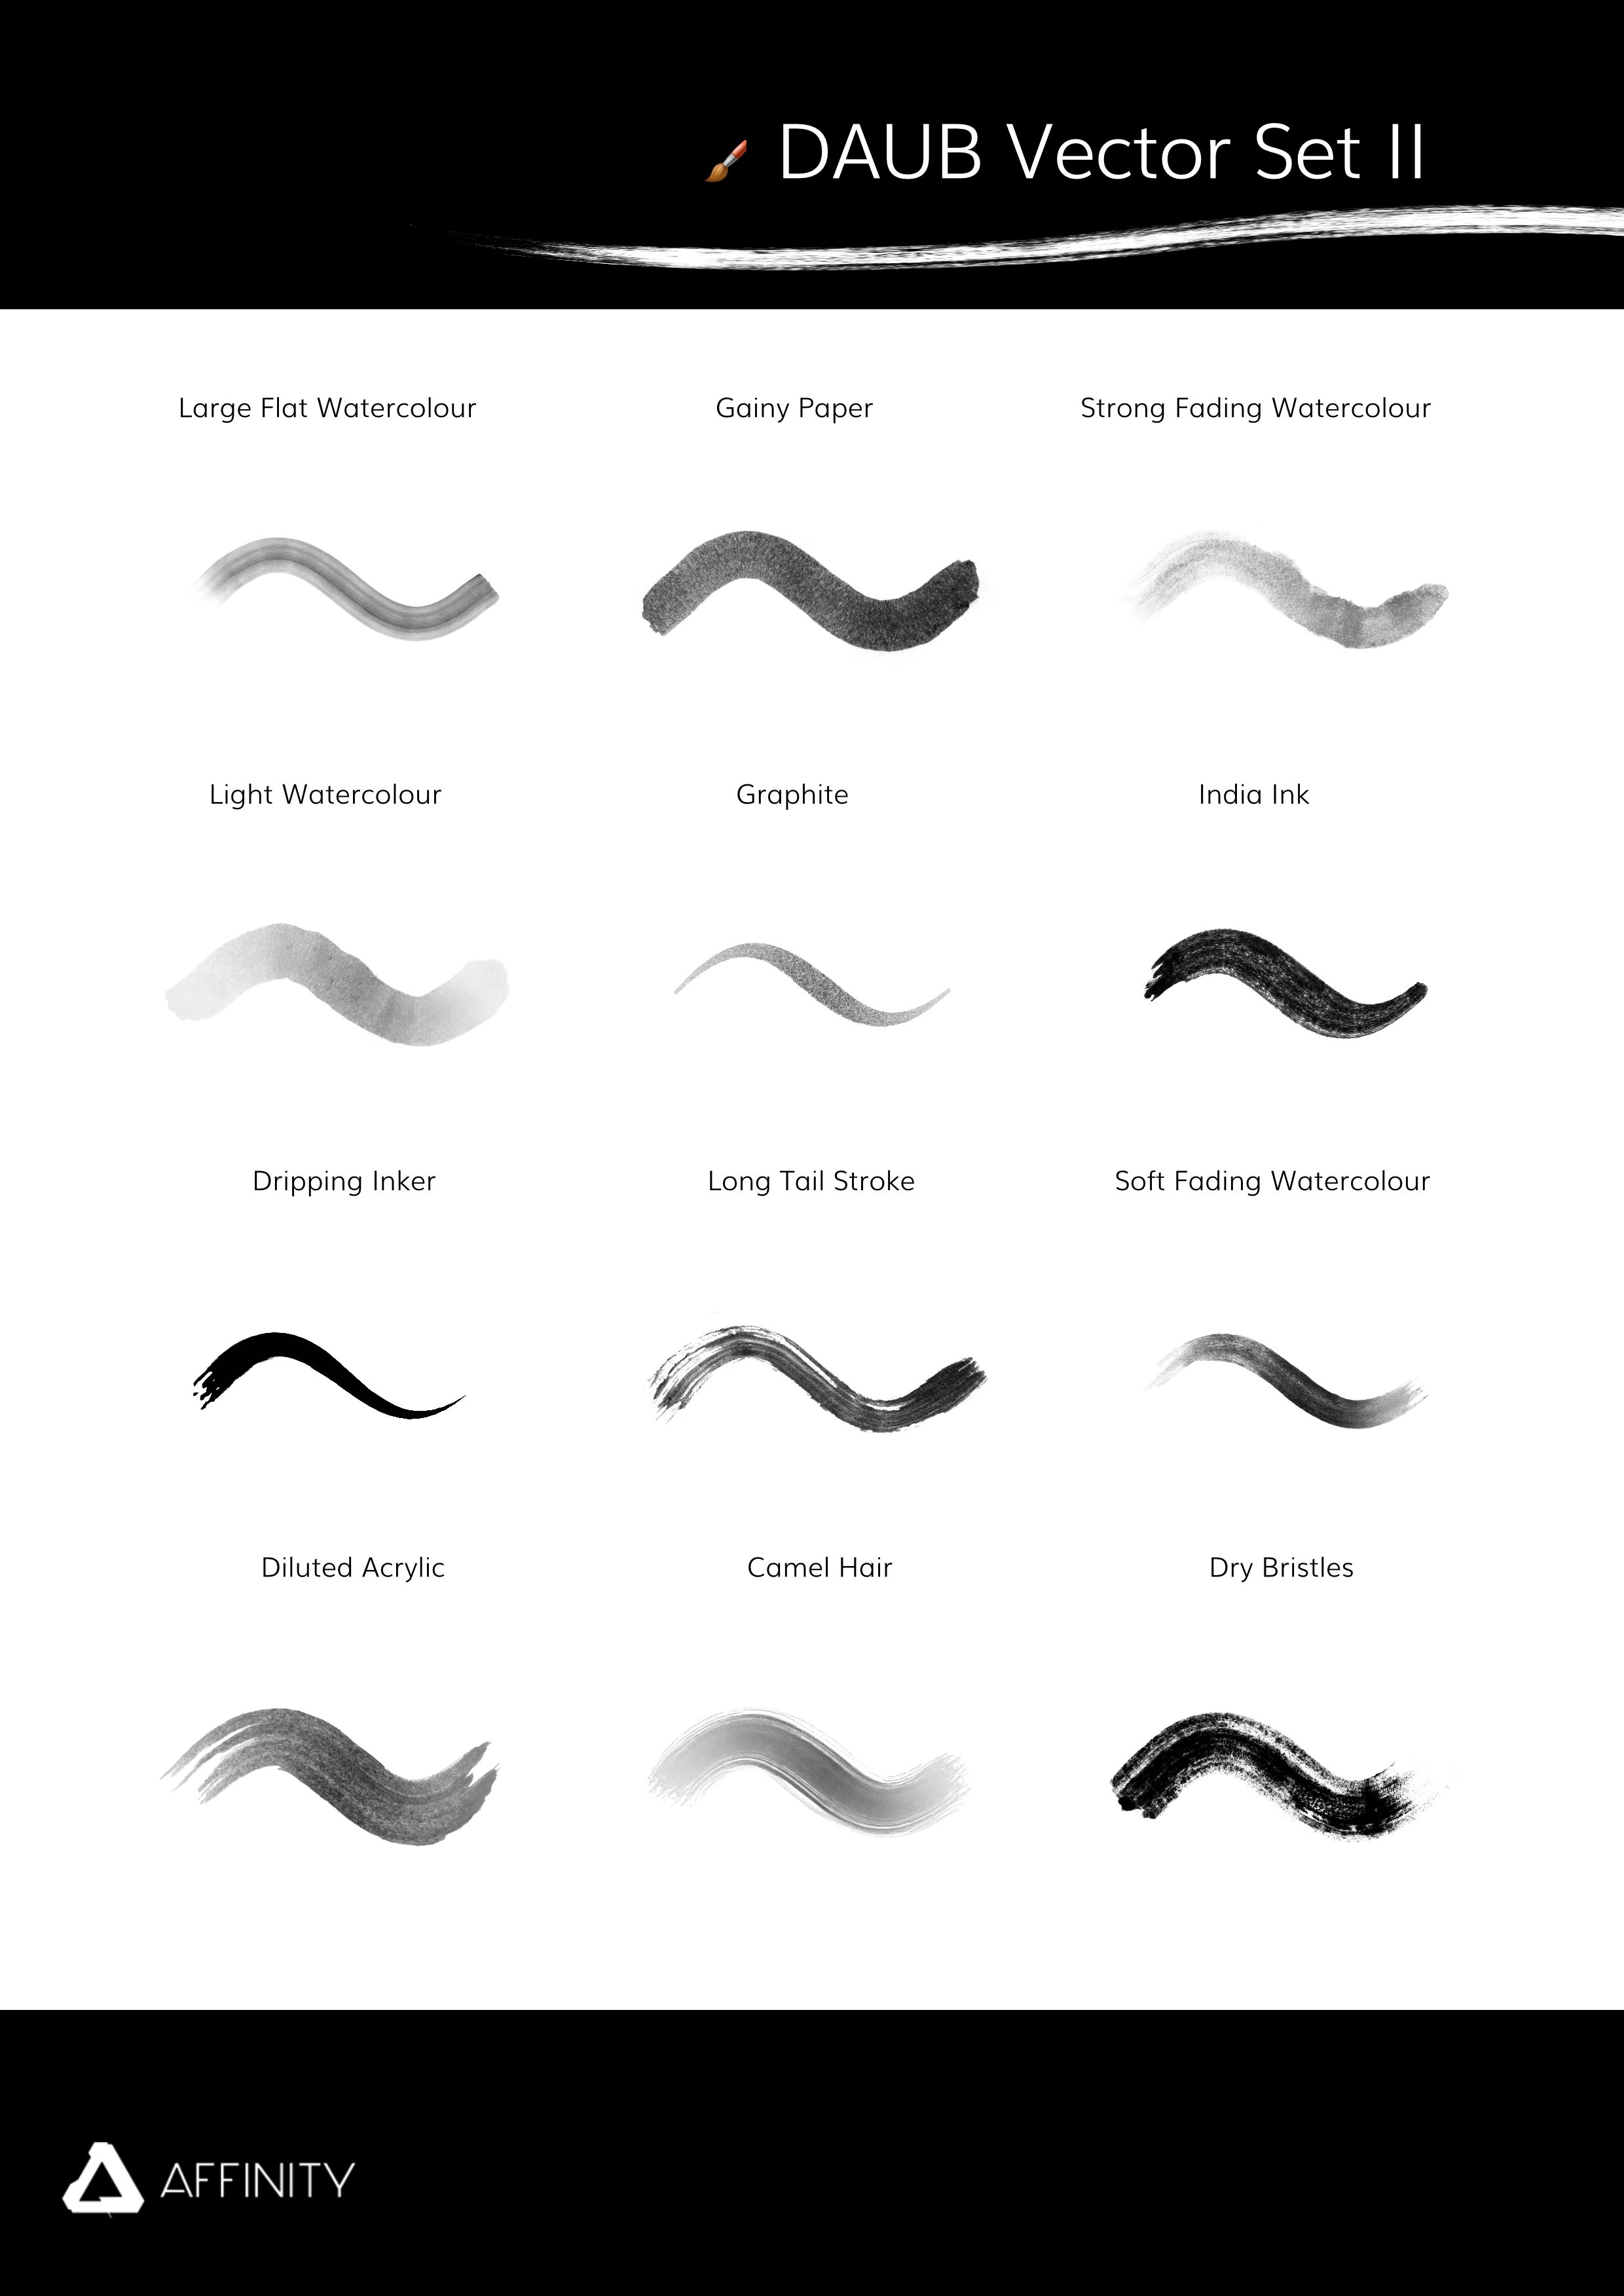 DAUB vector brush set for Afiinity Designer and Affinity Photo